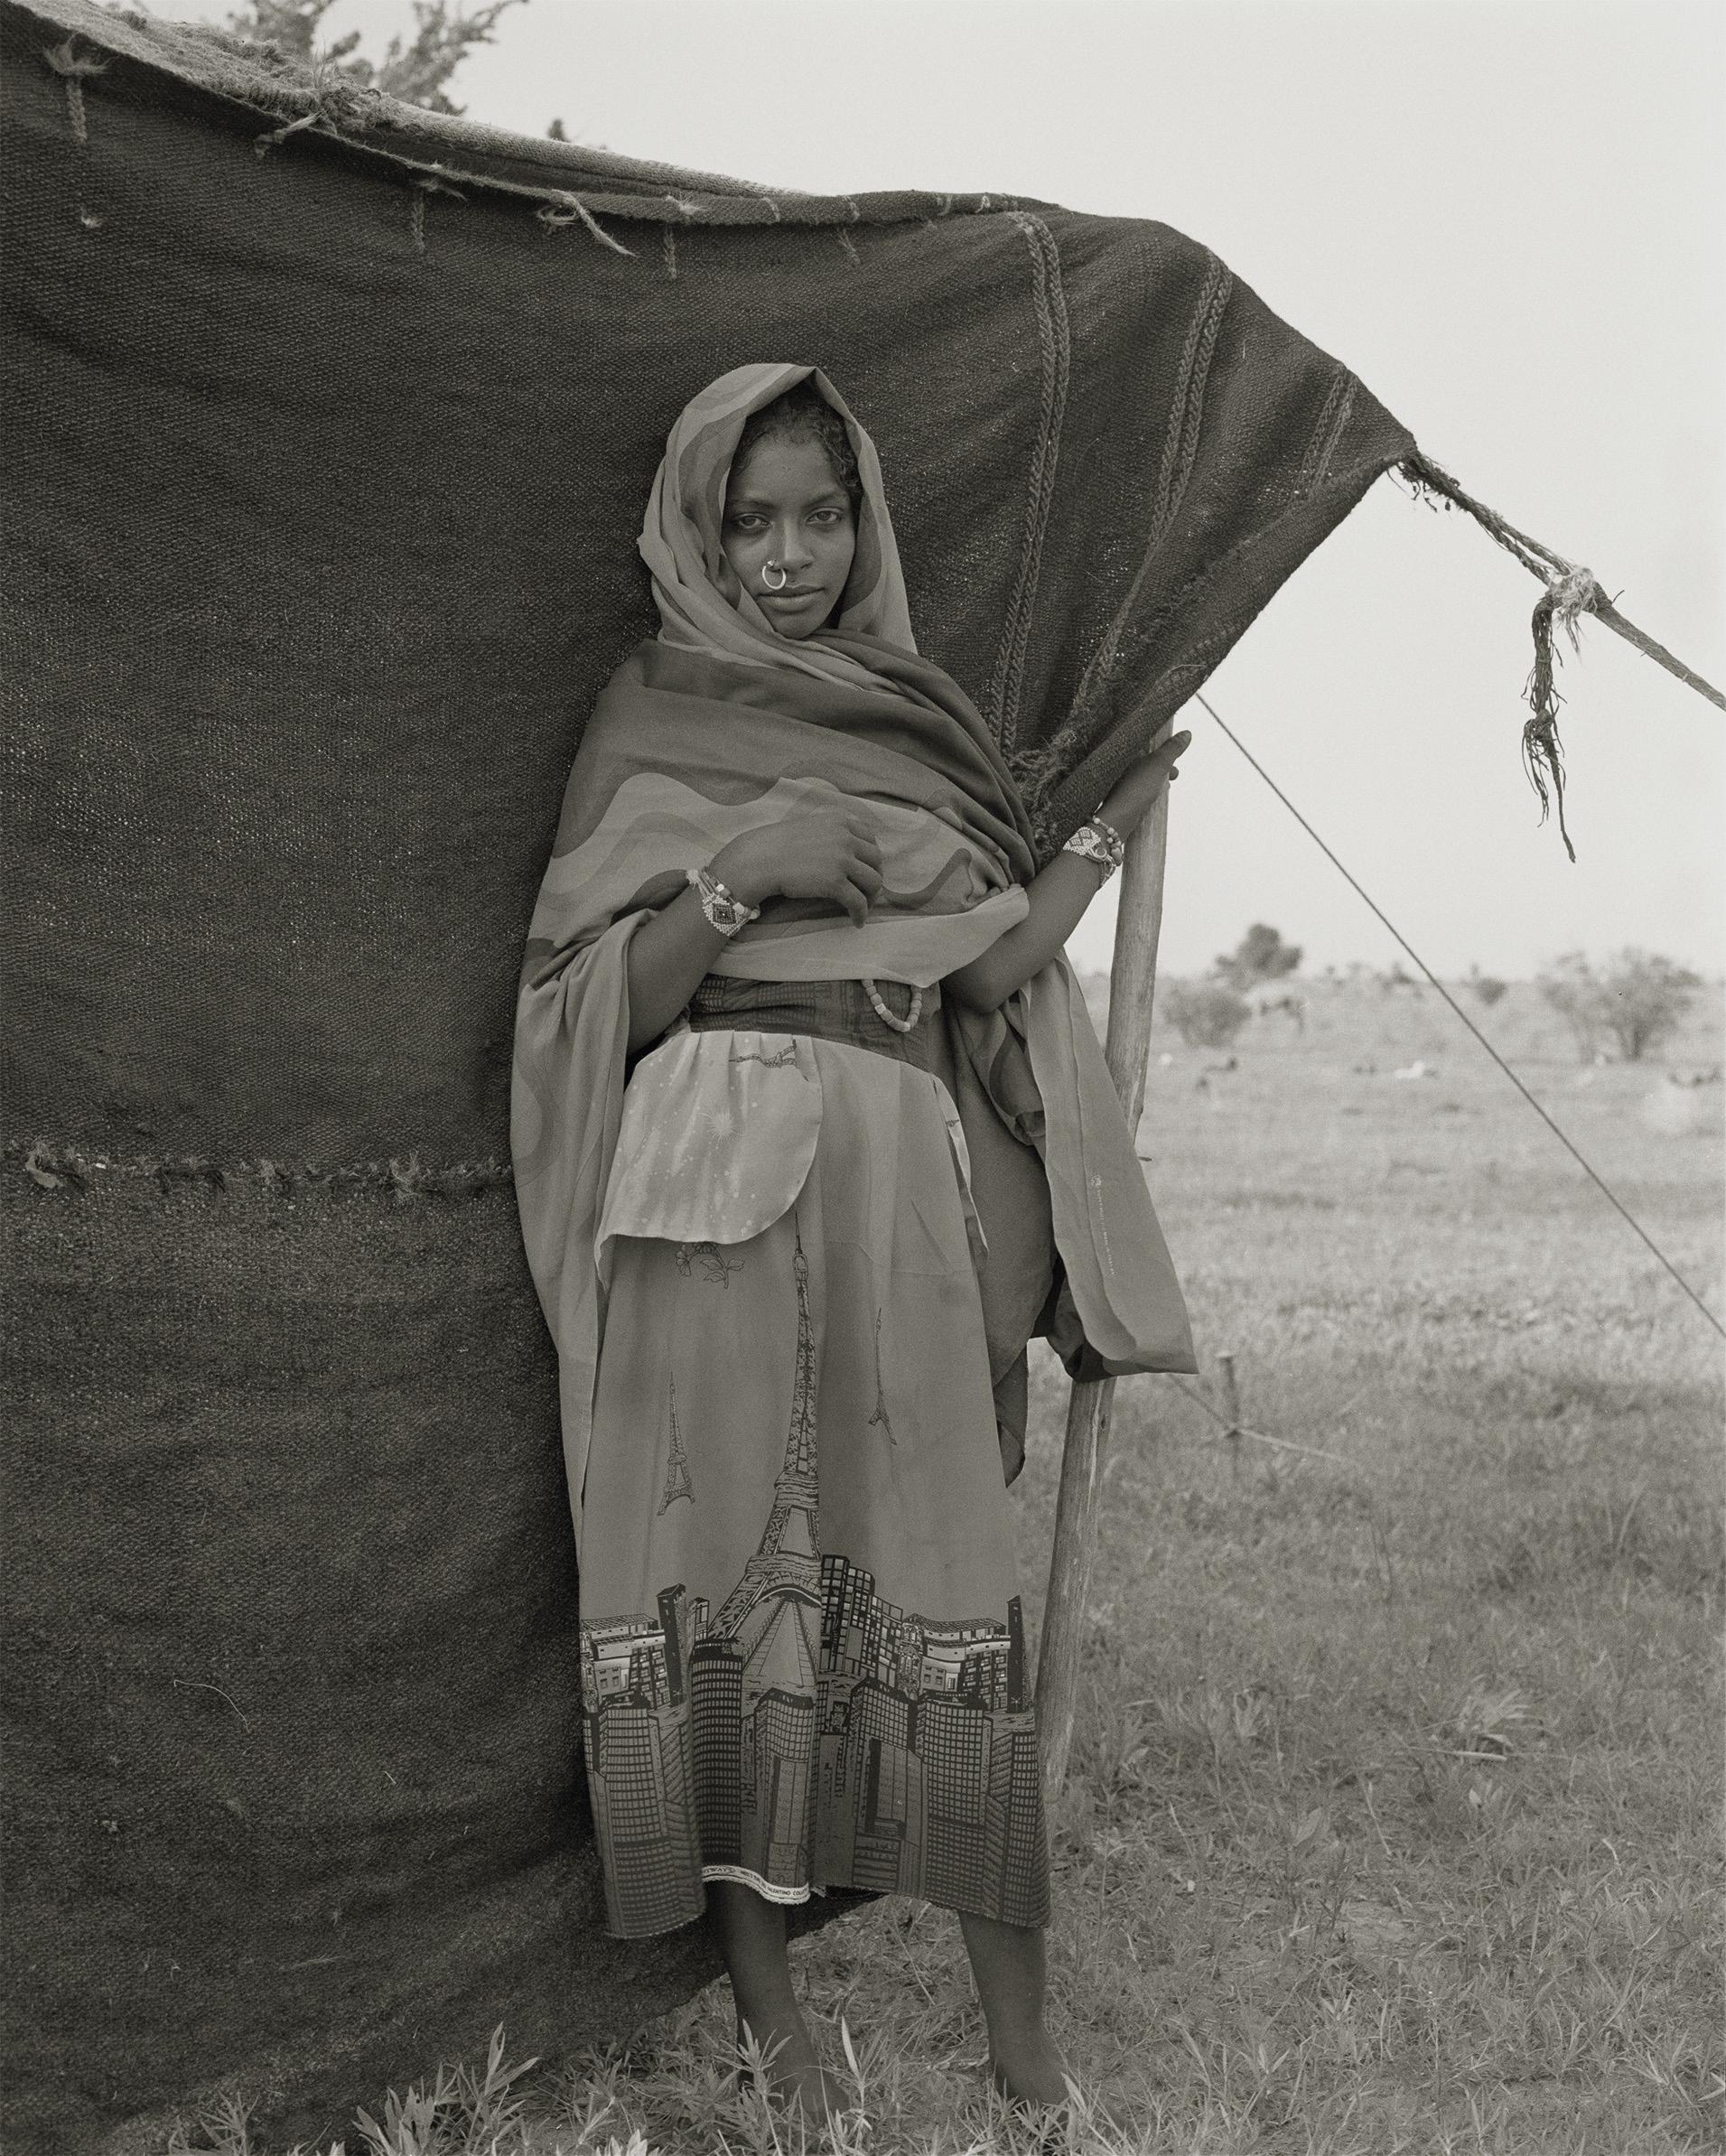 Claude Iverné, Mnaïma Adjak, Shénabla People, Awasma Clan, Dar Jawama, North Kordofan, Aug. 2001